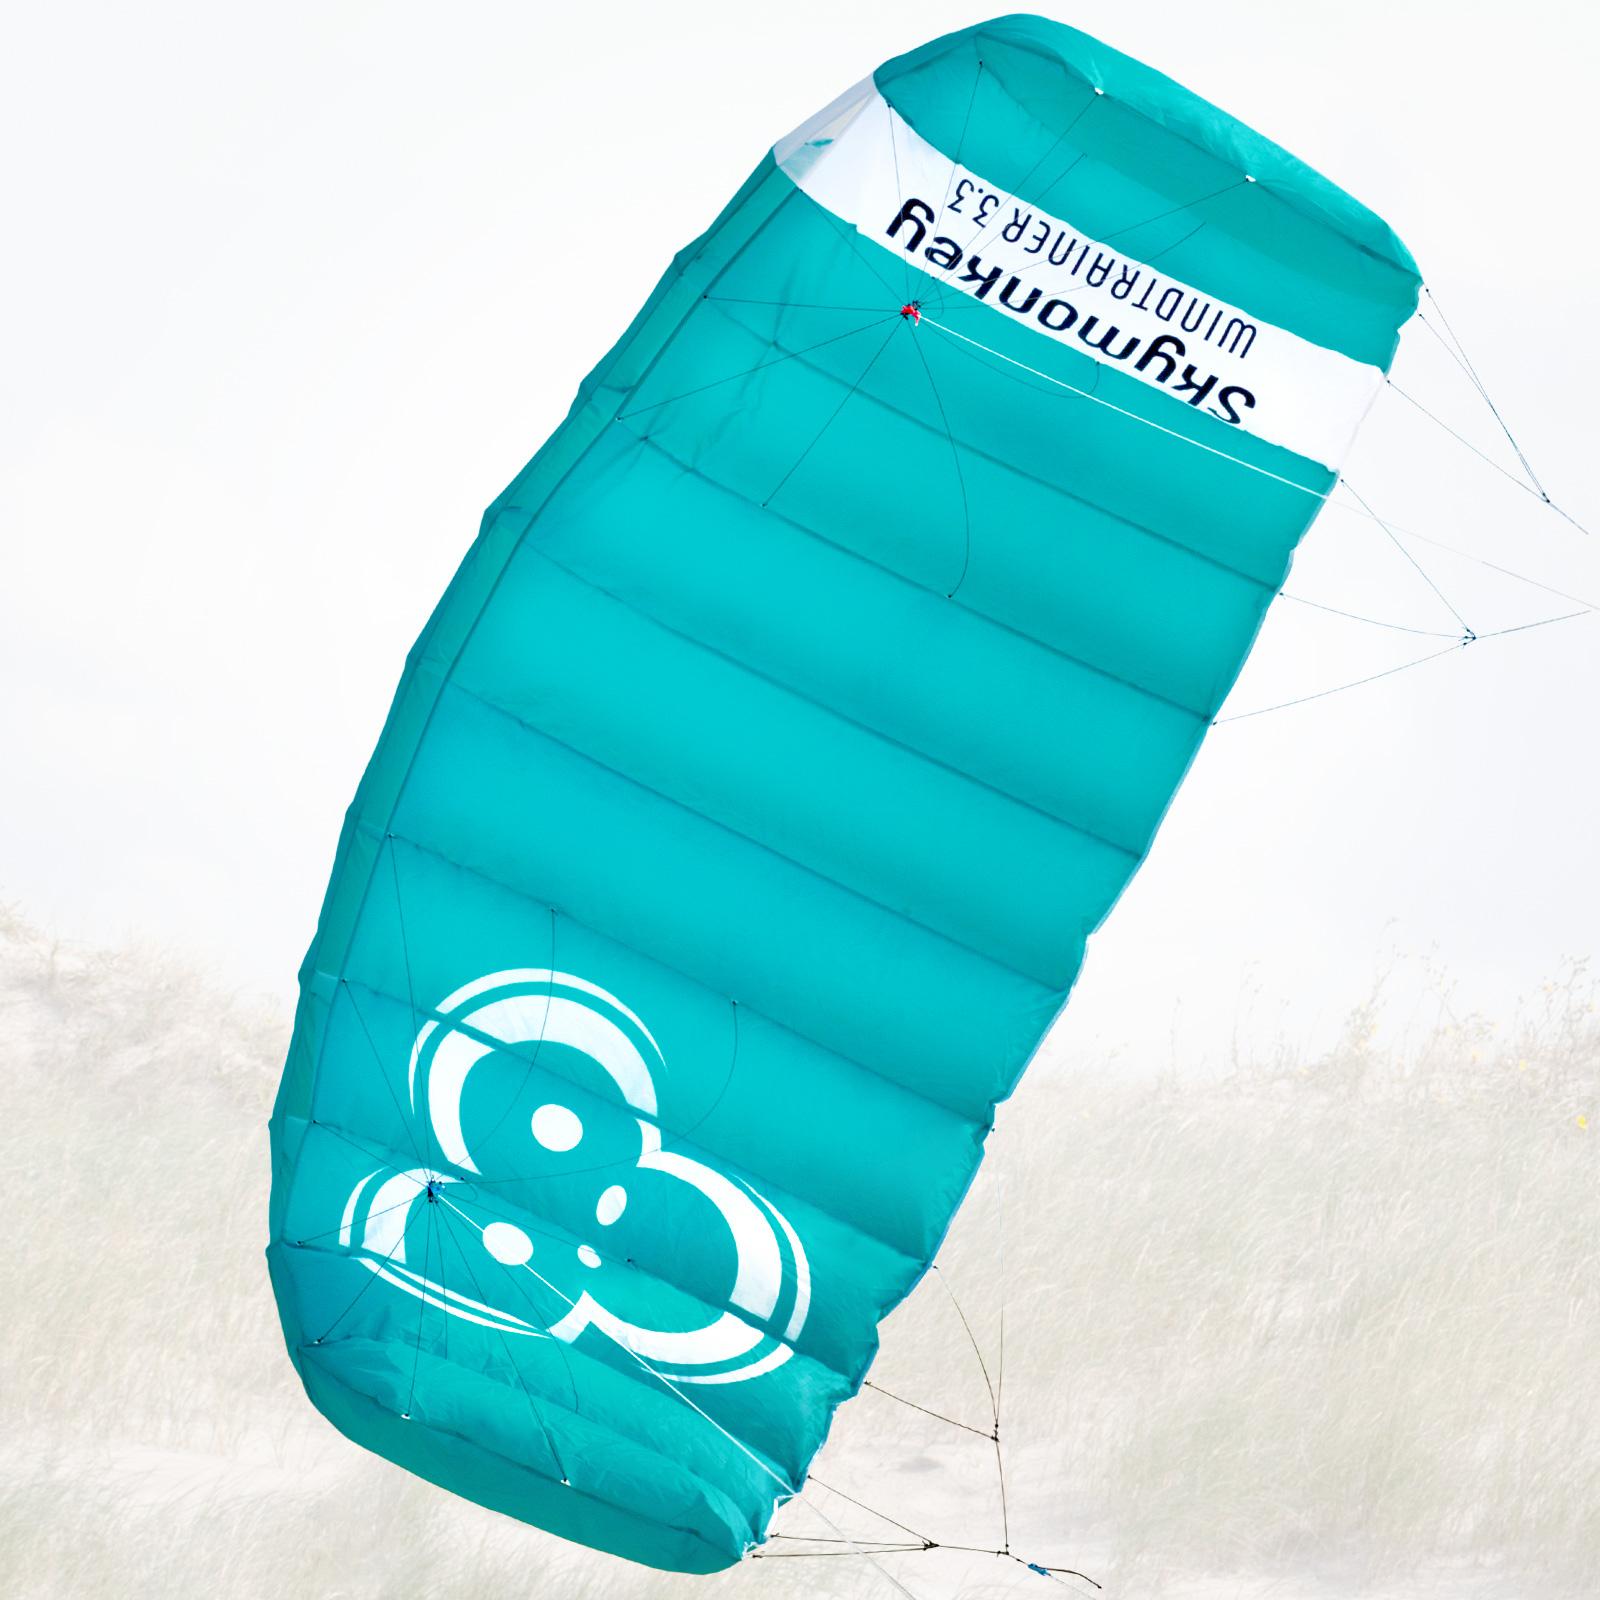 Lenkmatte SKYMONKEY Windtrainer 3.3 (Spannweite: 330 cm) Trainerkite Kite Kite Kite Drache 711062